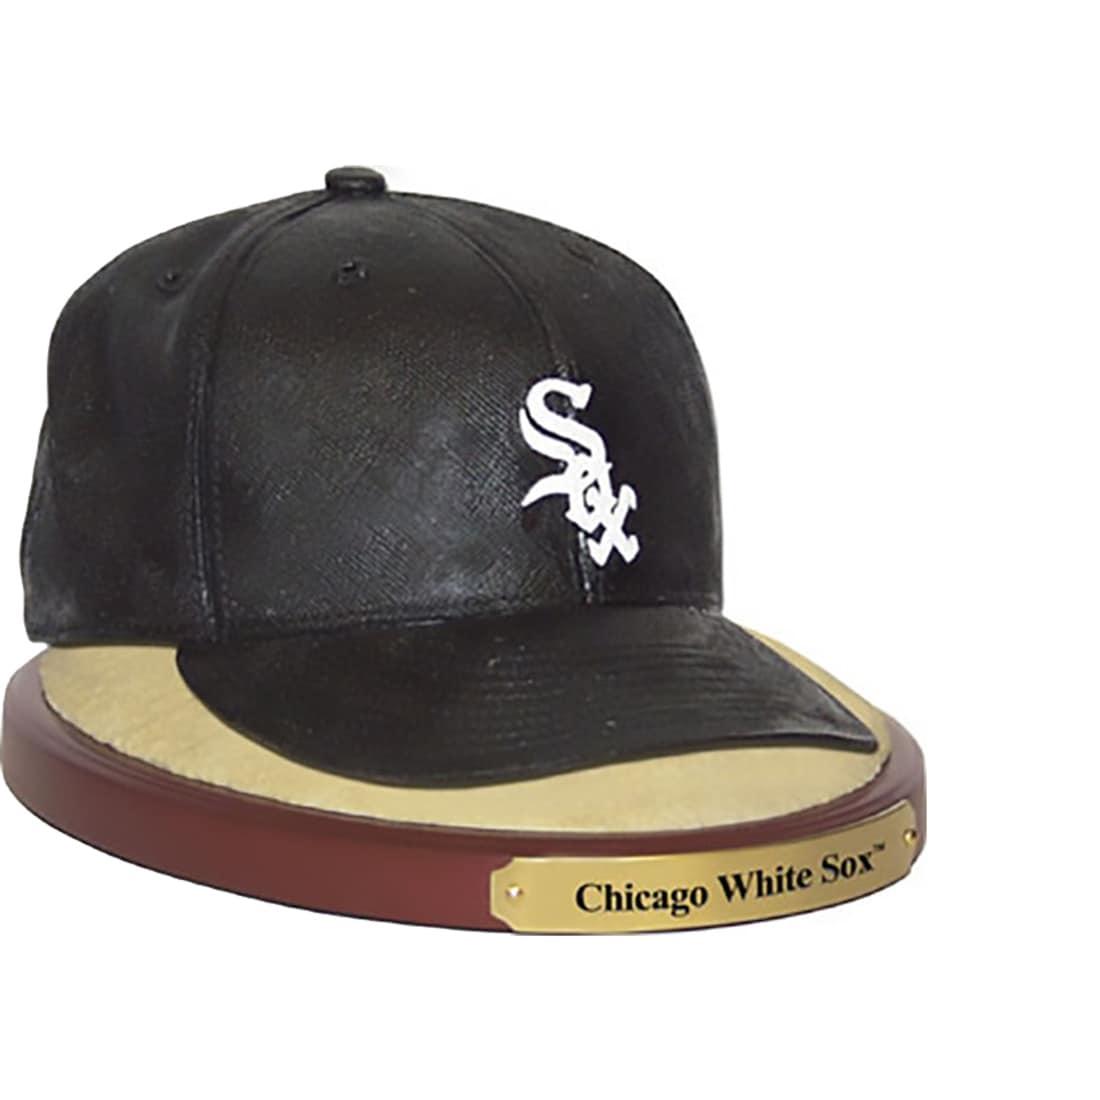 Chicago White Sox Desk Replica MLB Cap